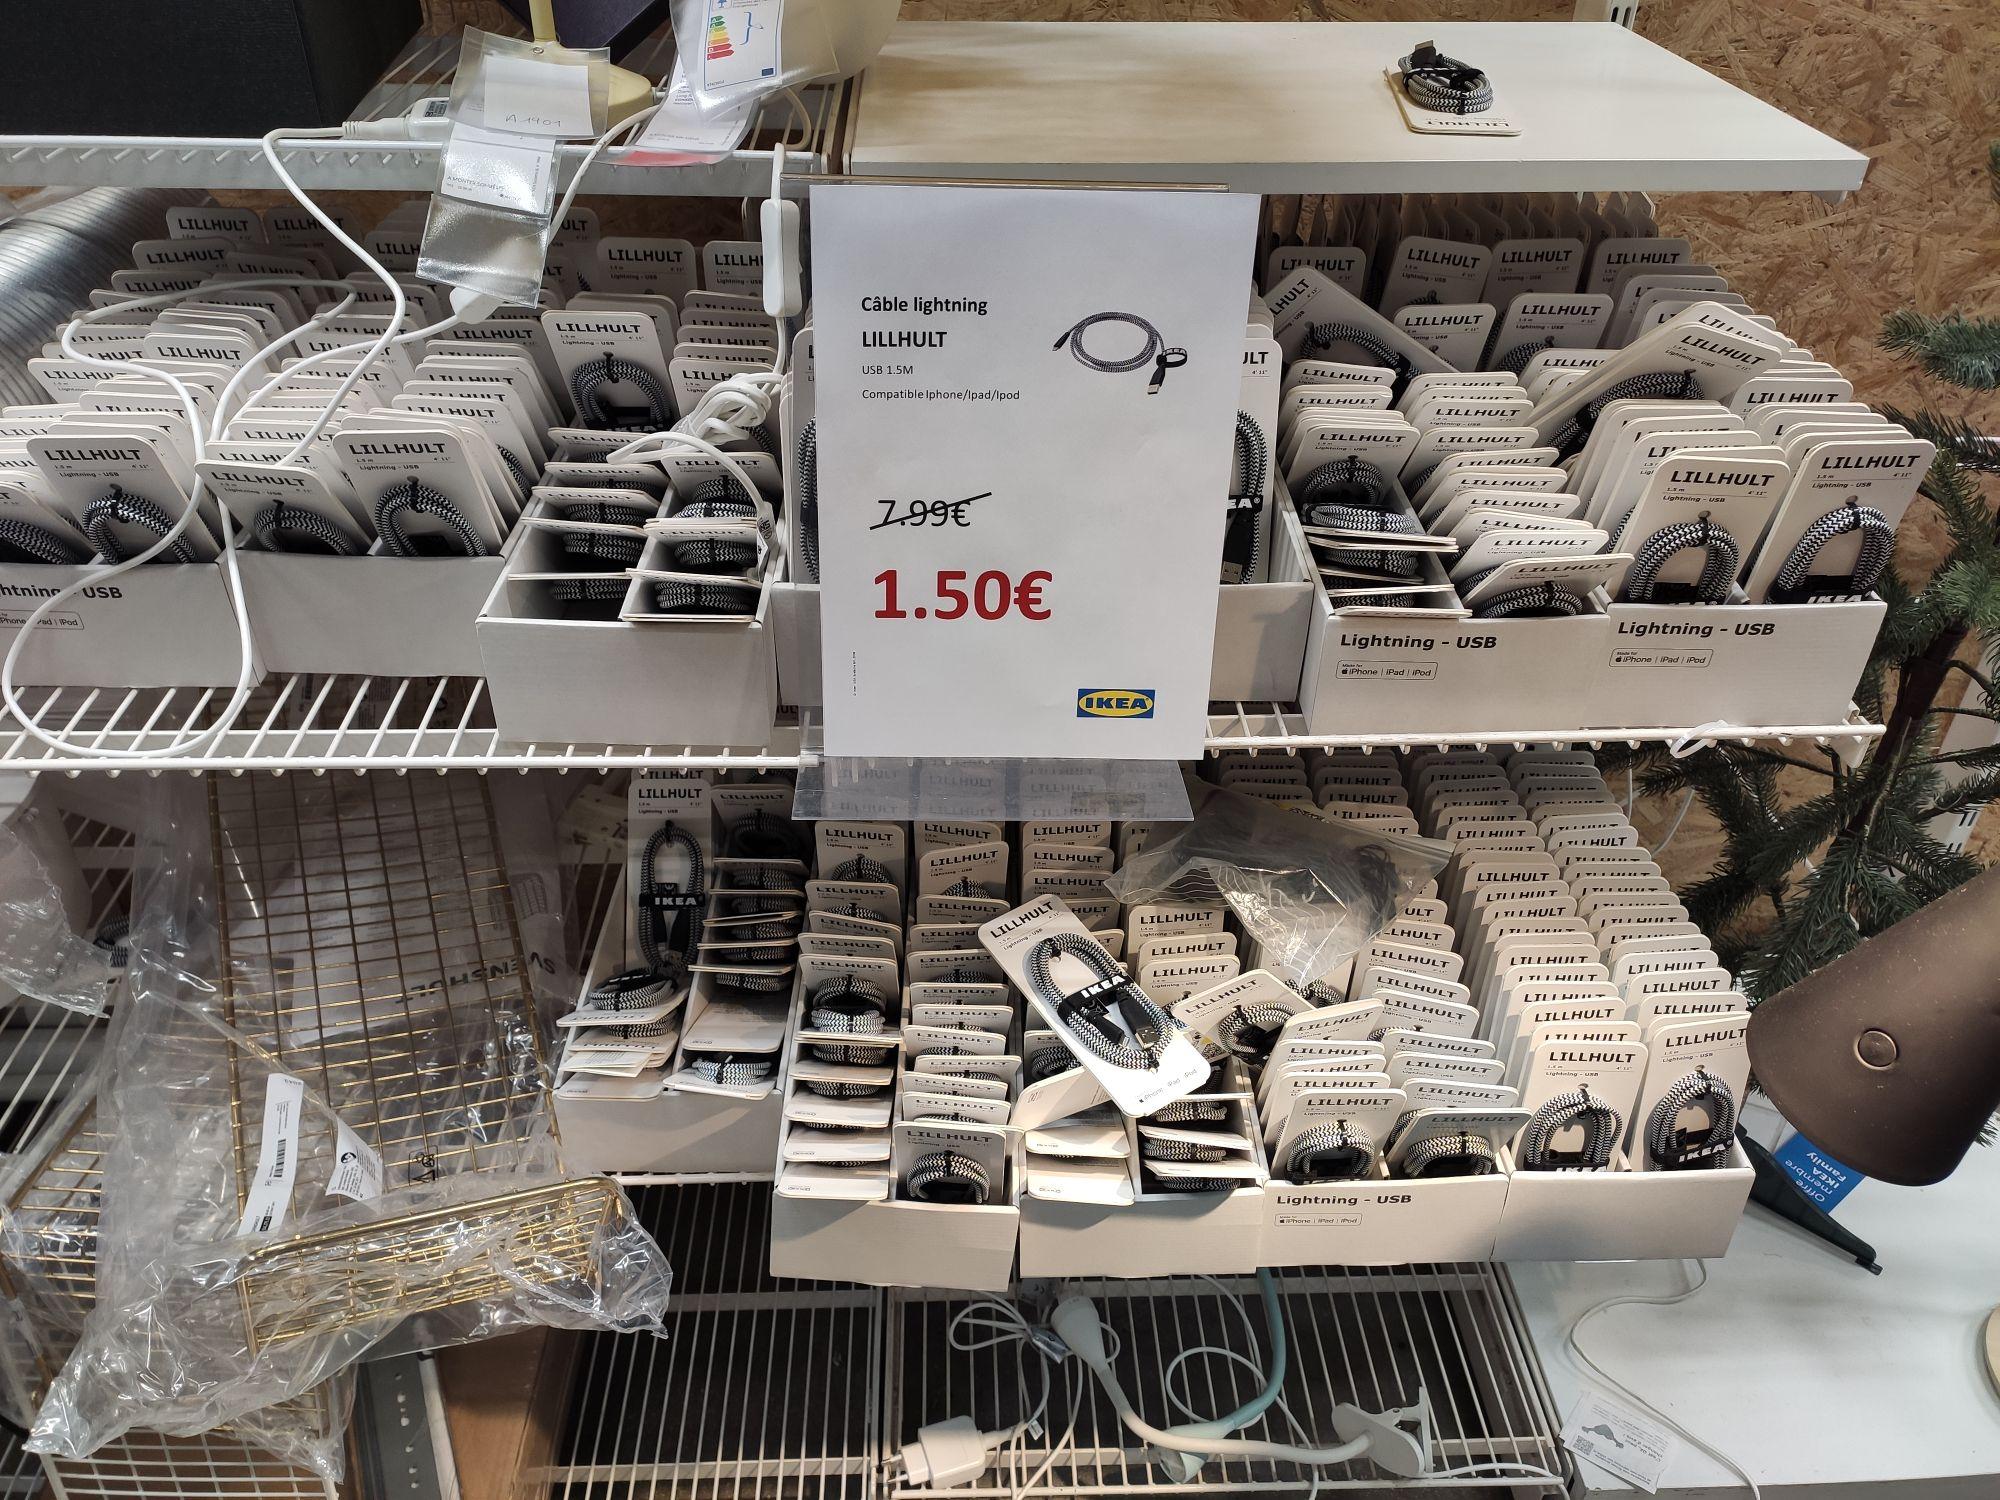 Câble lightning Ikea Lillhut 1,50m - Lomme (59)